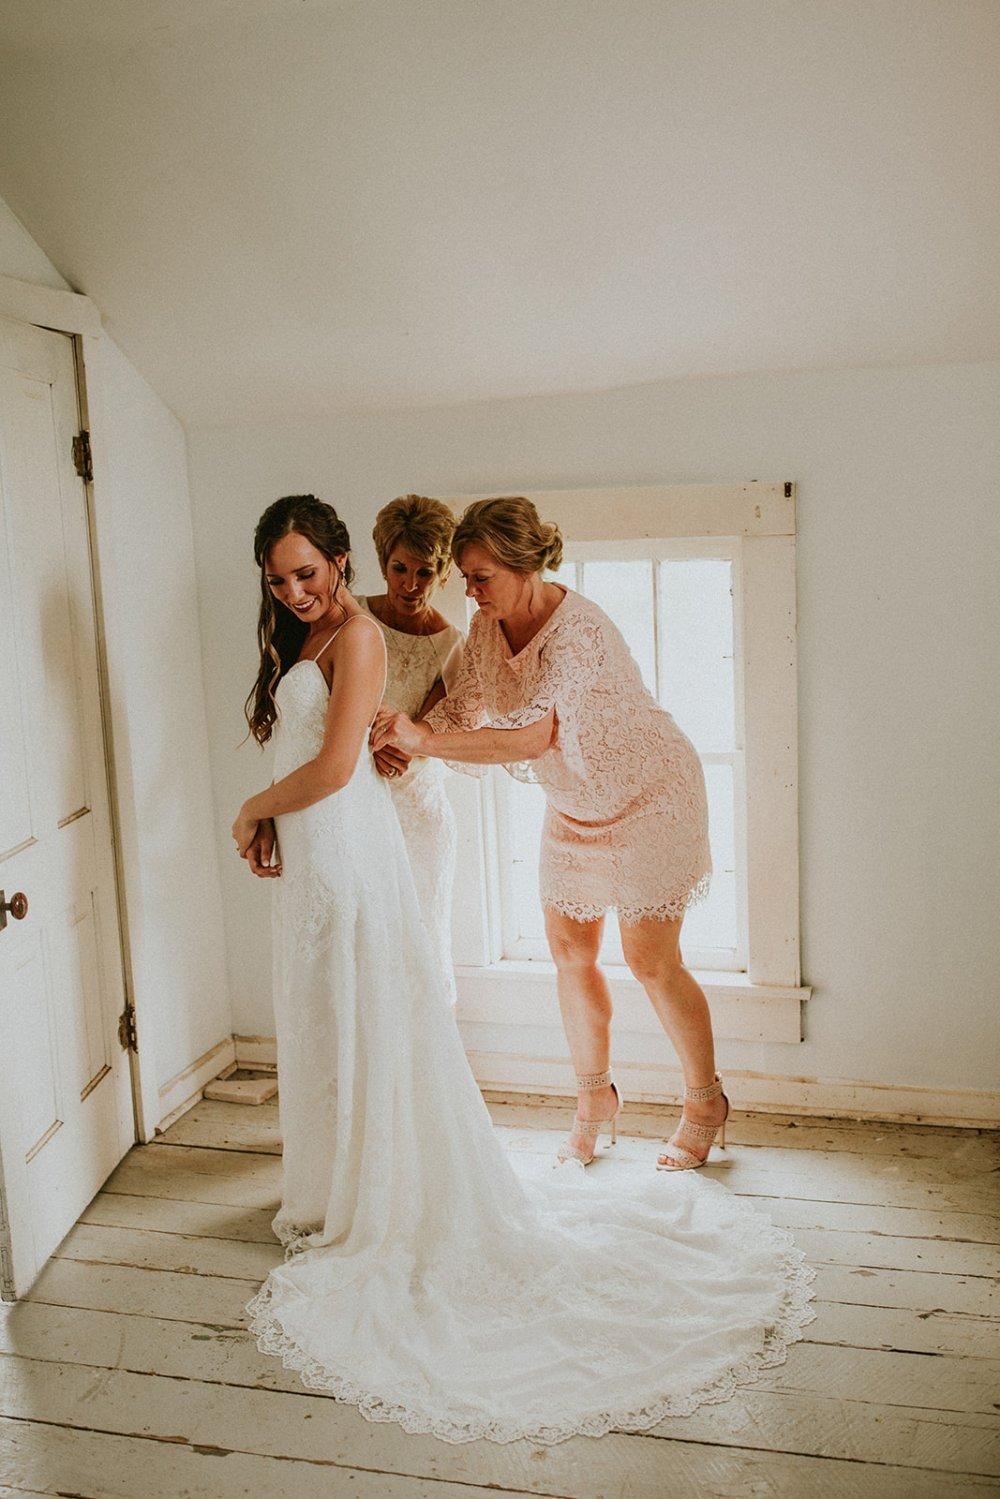 Calan-Adam-WEDDING-JUNE-2019-21.jpg